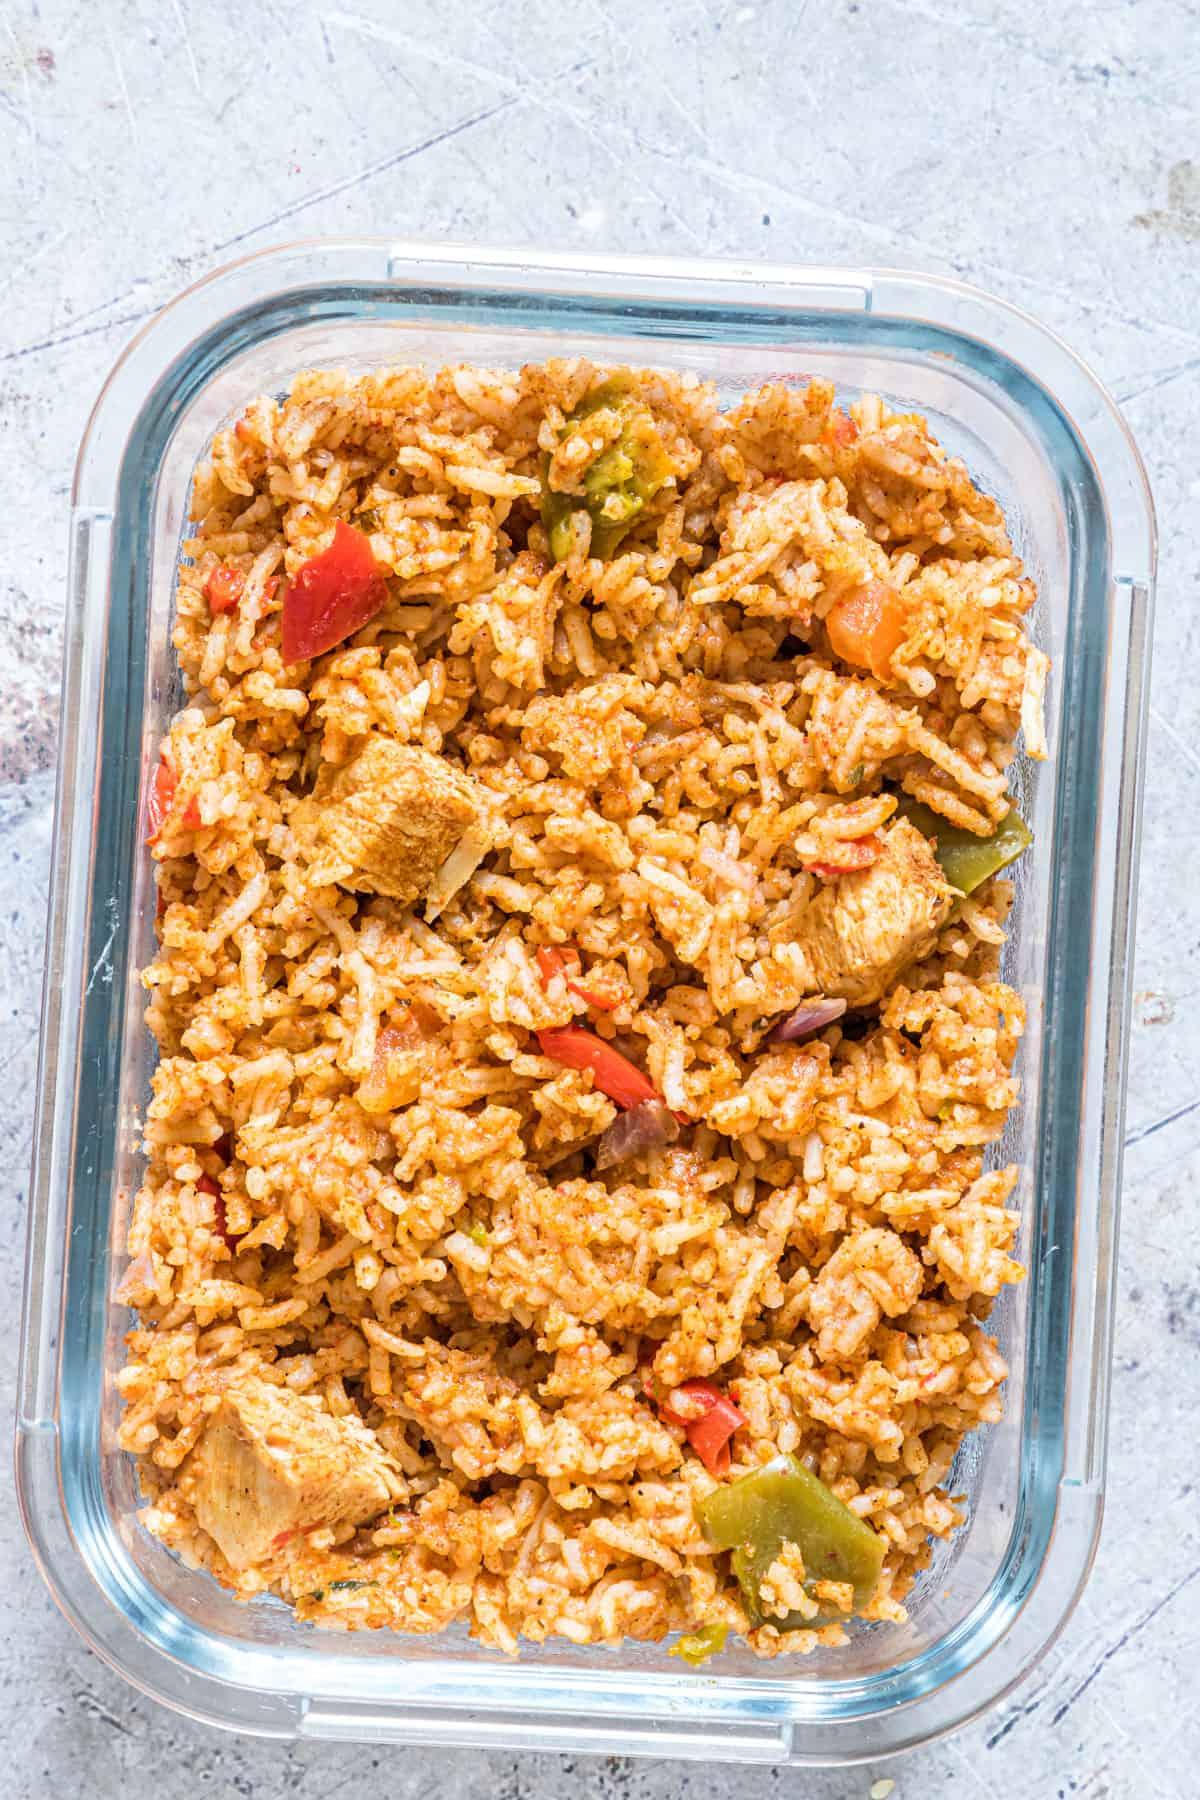 the fajita rice inside a glass food storage container